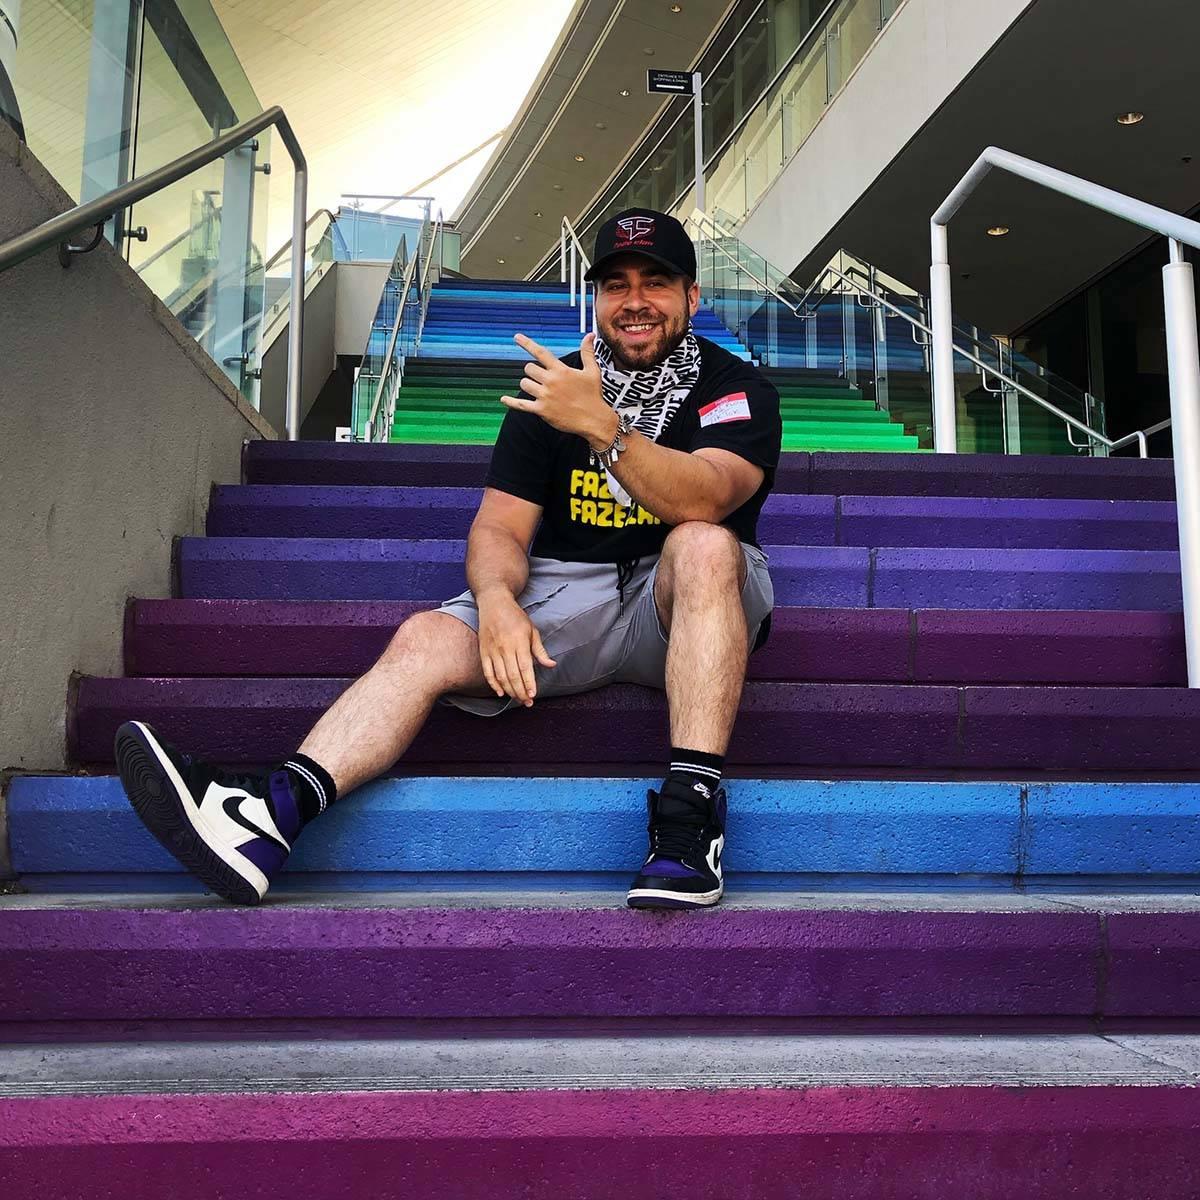 Las Vegas TikTok creator P.J. Brittain has amassed more than 1.7 million followers. (Photo cour ...